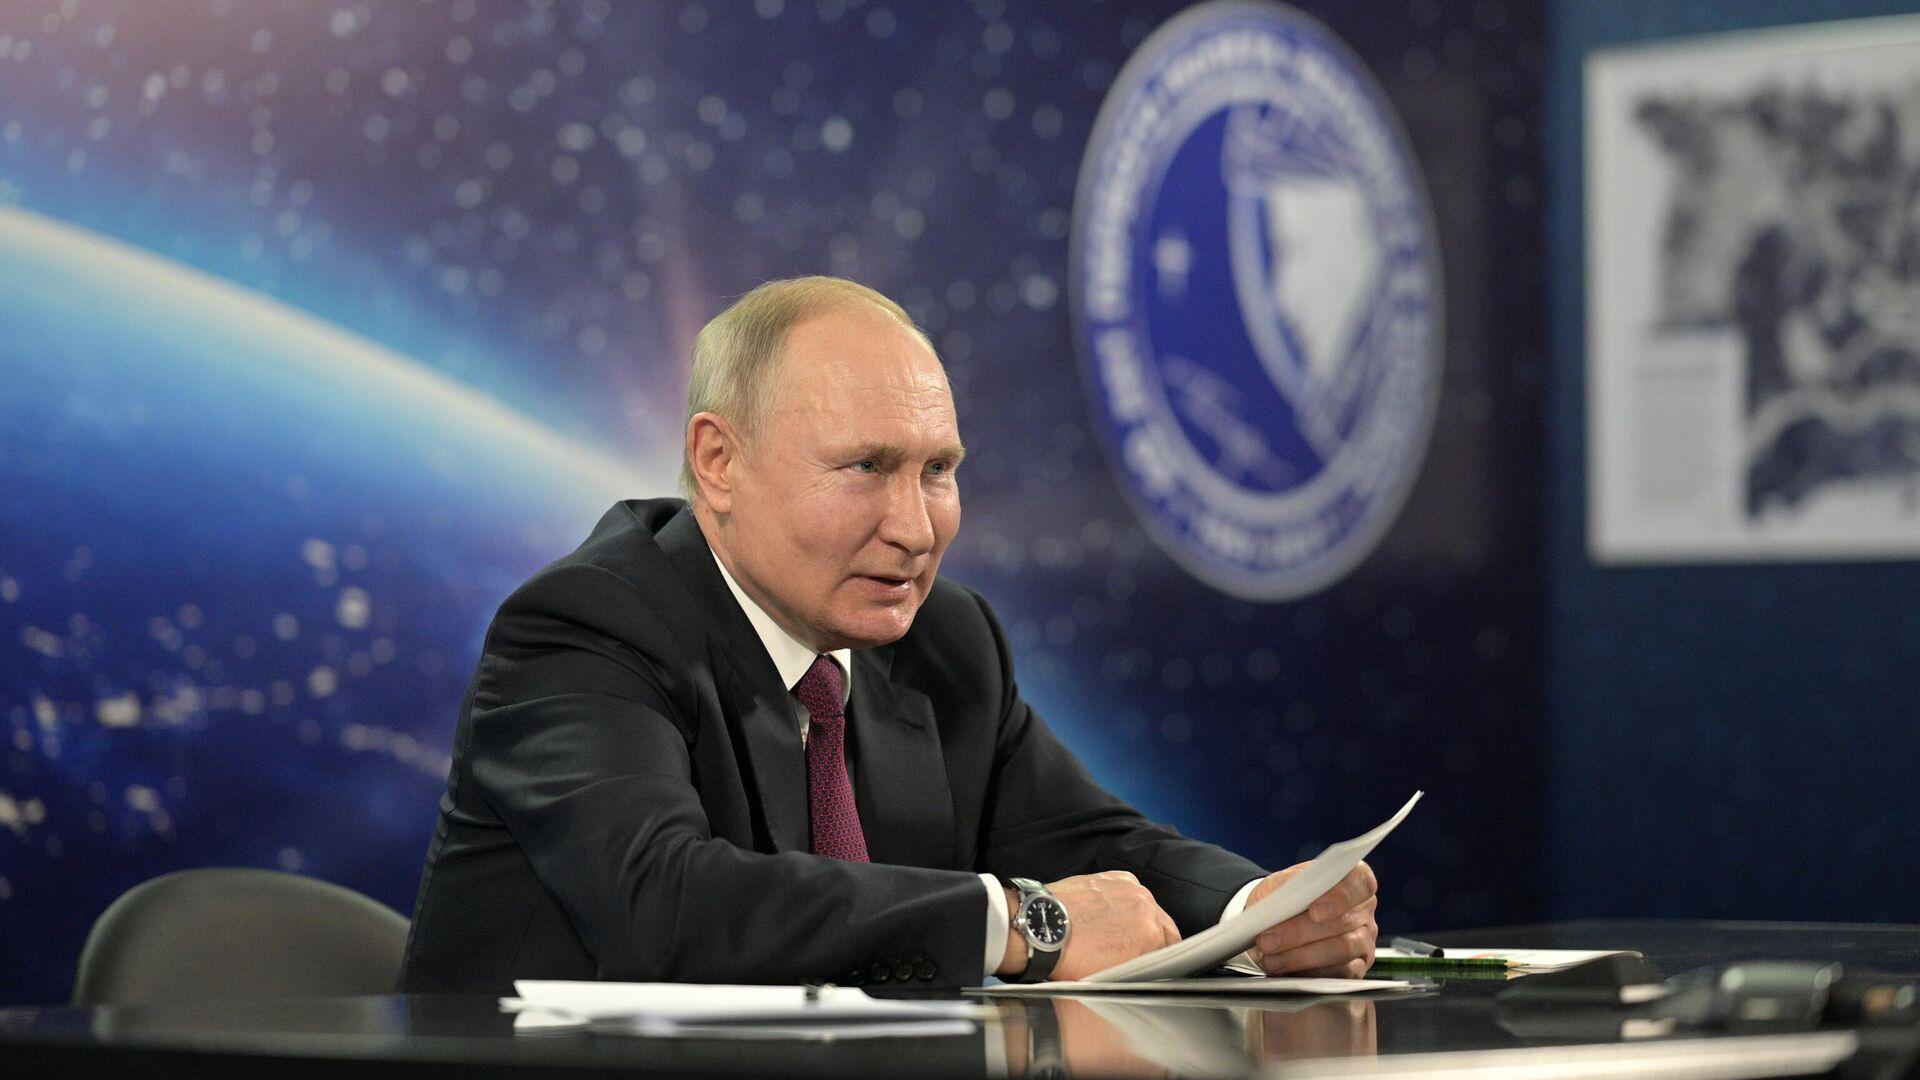 Vladímir Putin, presidente de Rusia - Sputnik Mundo, 1920, 12.04.2021